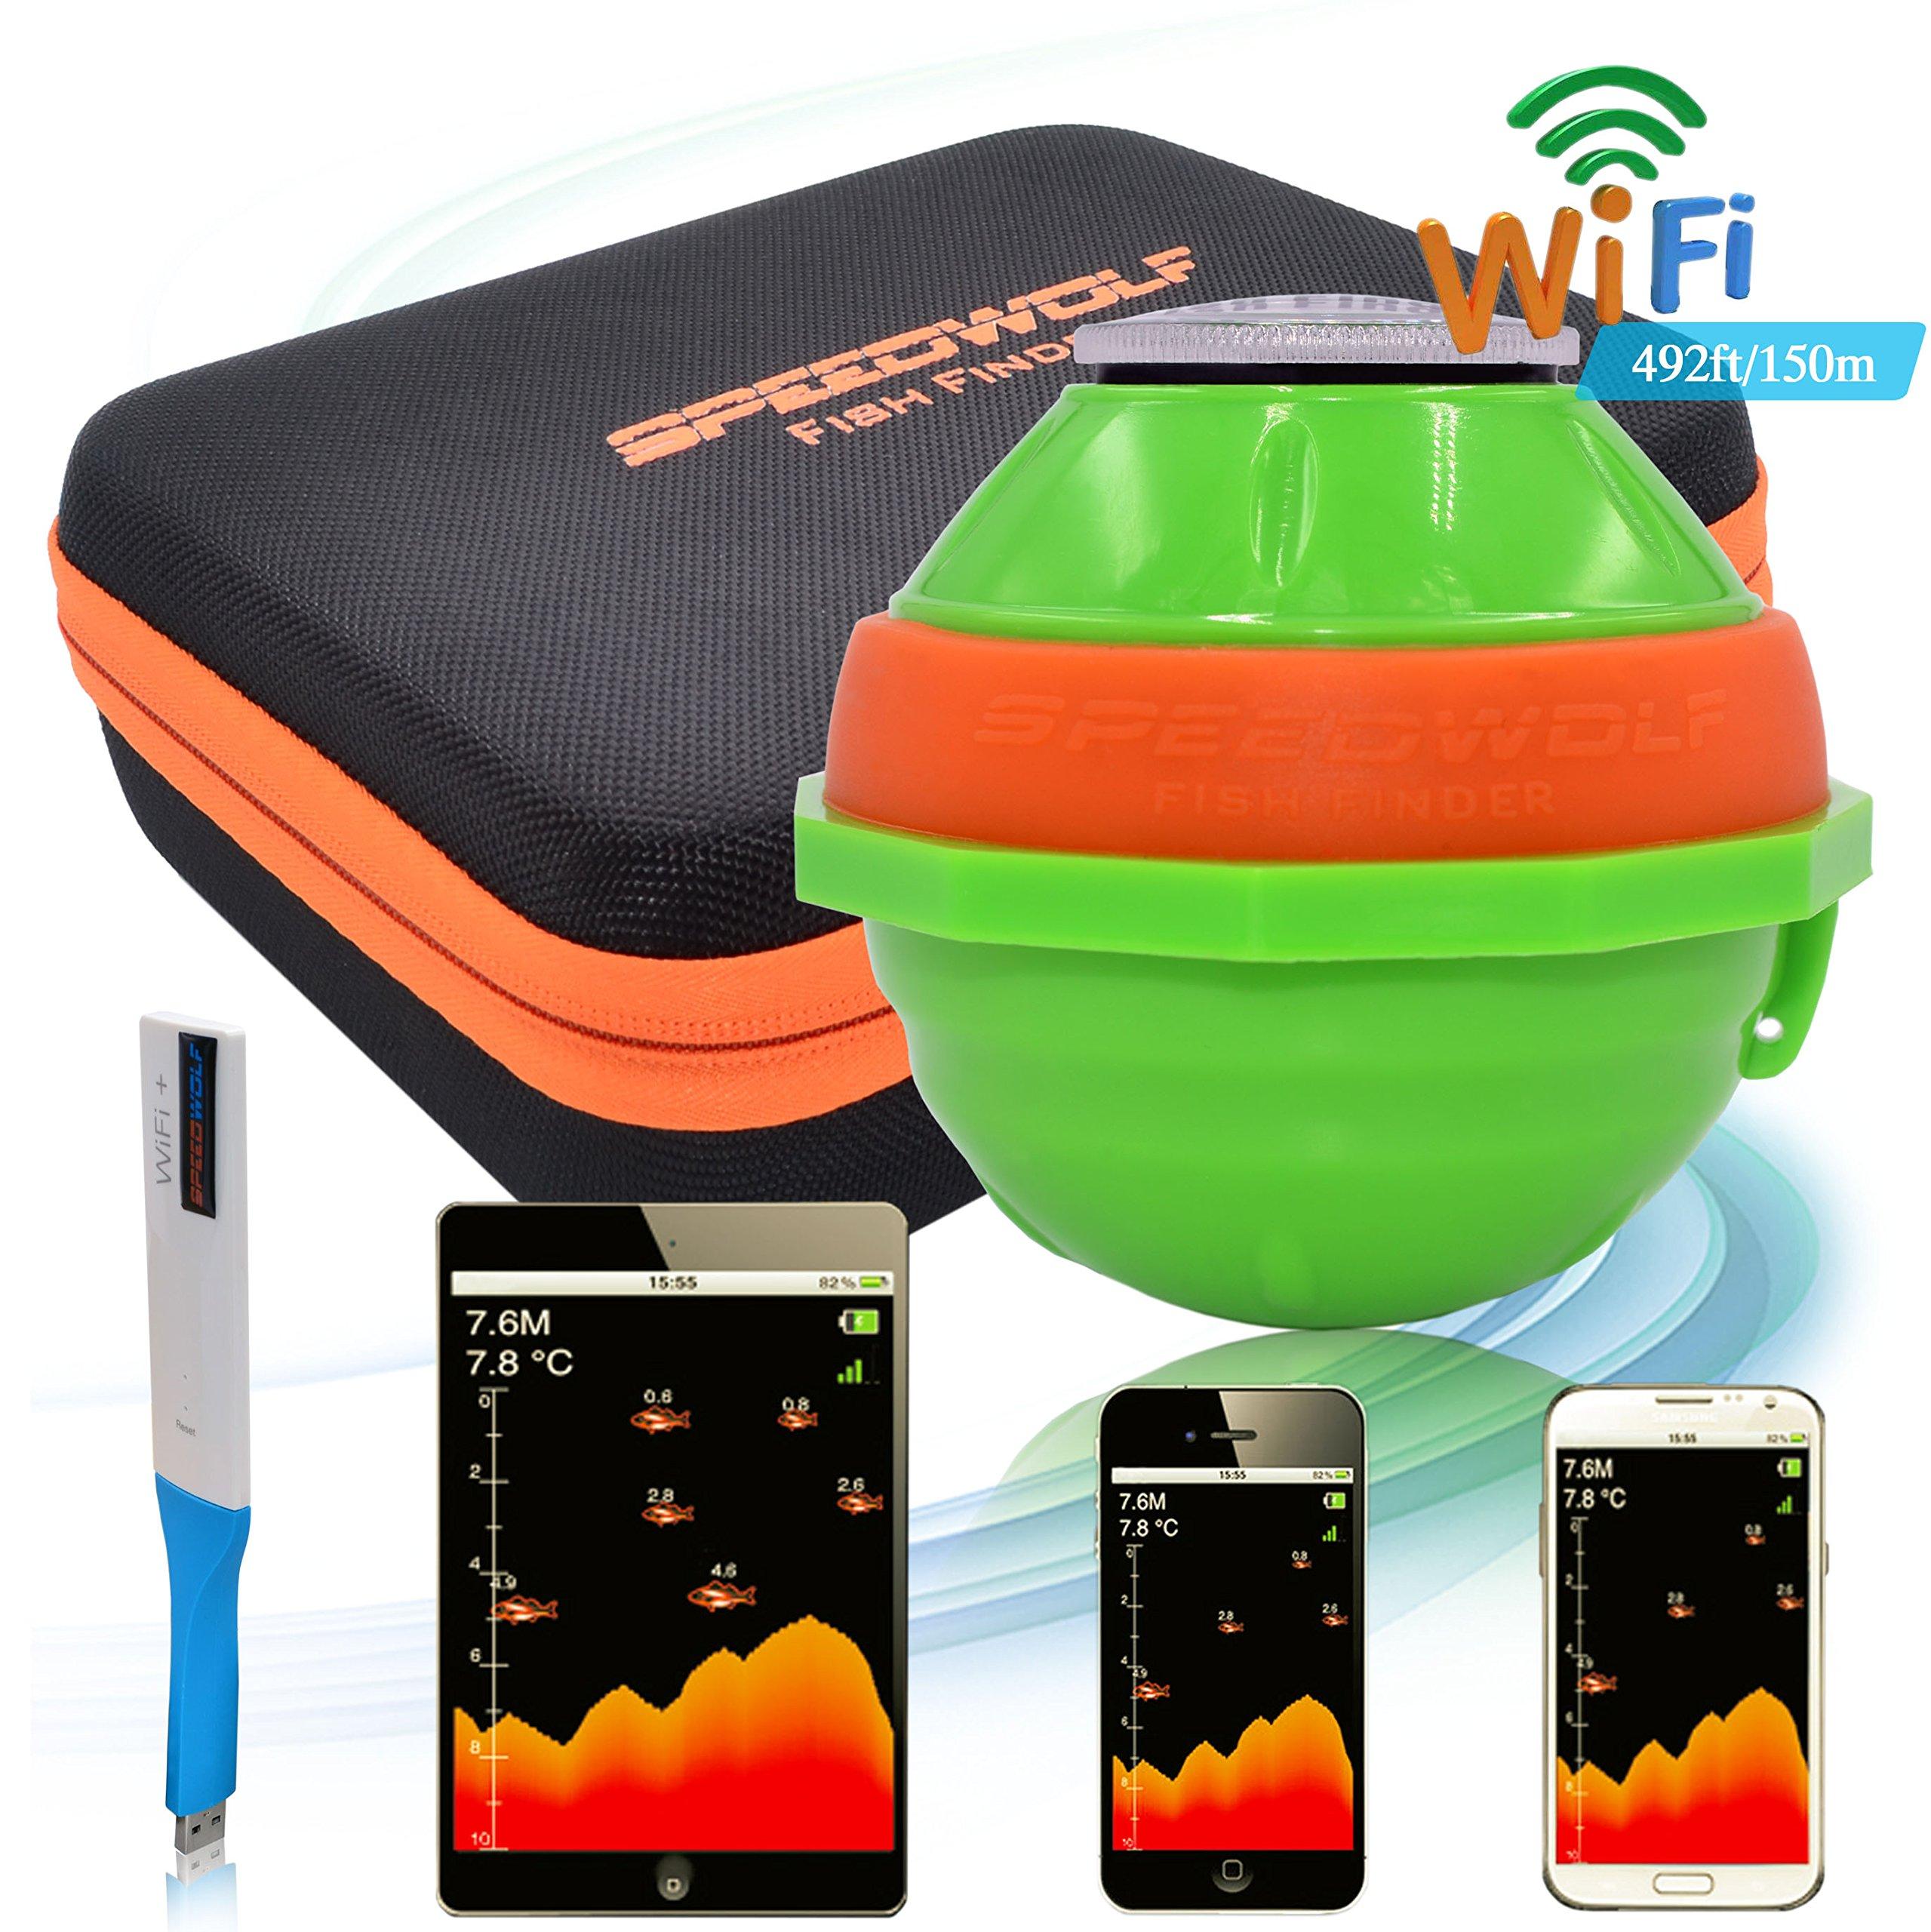 SPEEDWOLF 492ft Long Distance Portable Wireless Sonar WIFI Sounder Fish Finder Chartplotter Graph